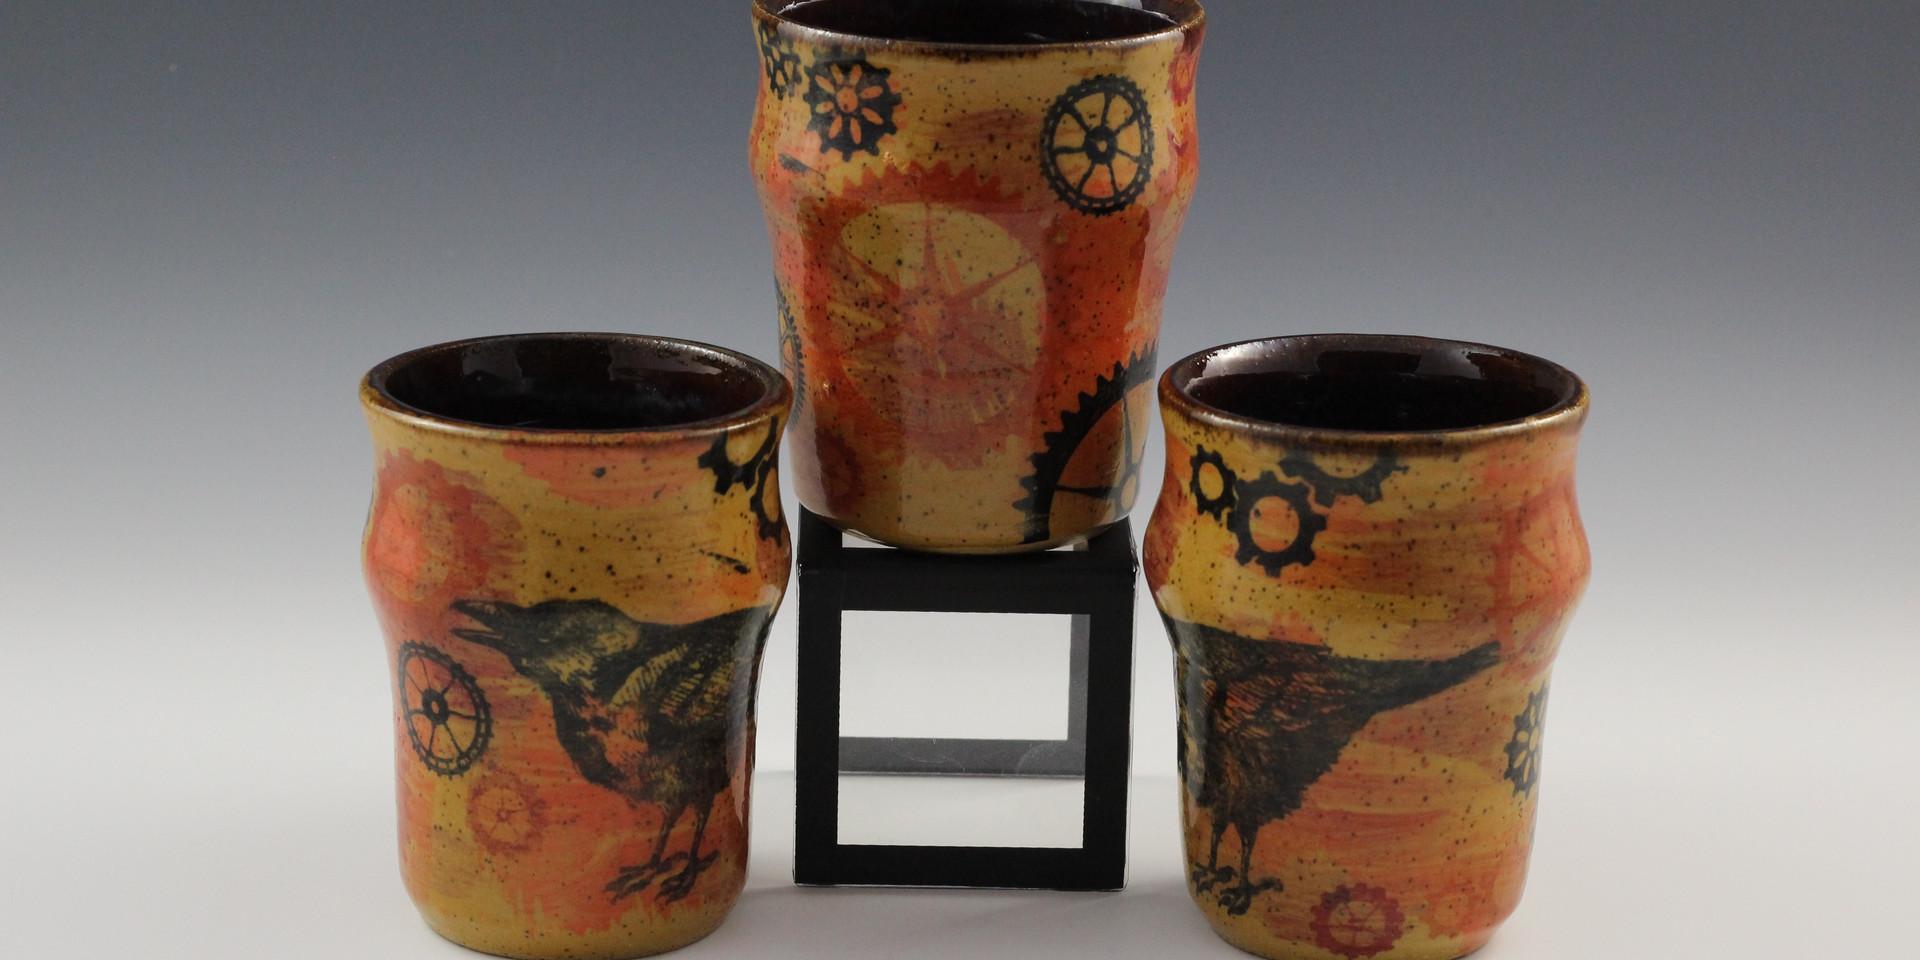 SteamPunk Raven Cups